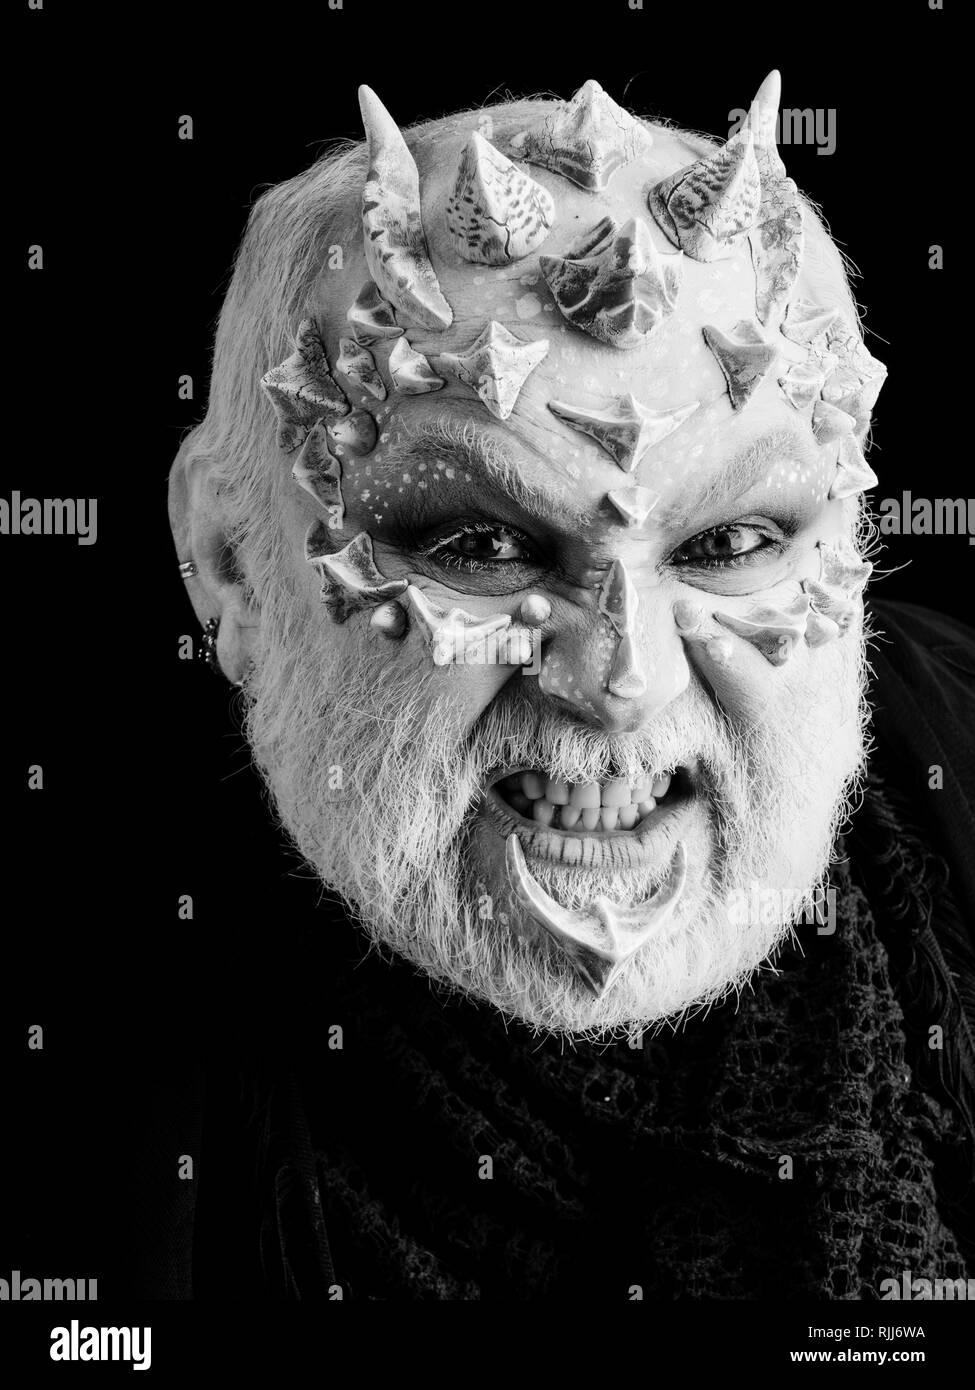 Angry monster man baring teeth - Stock Image